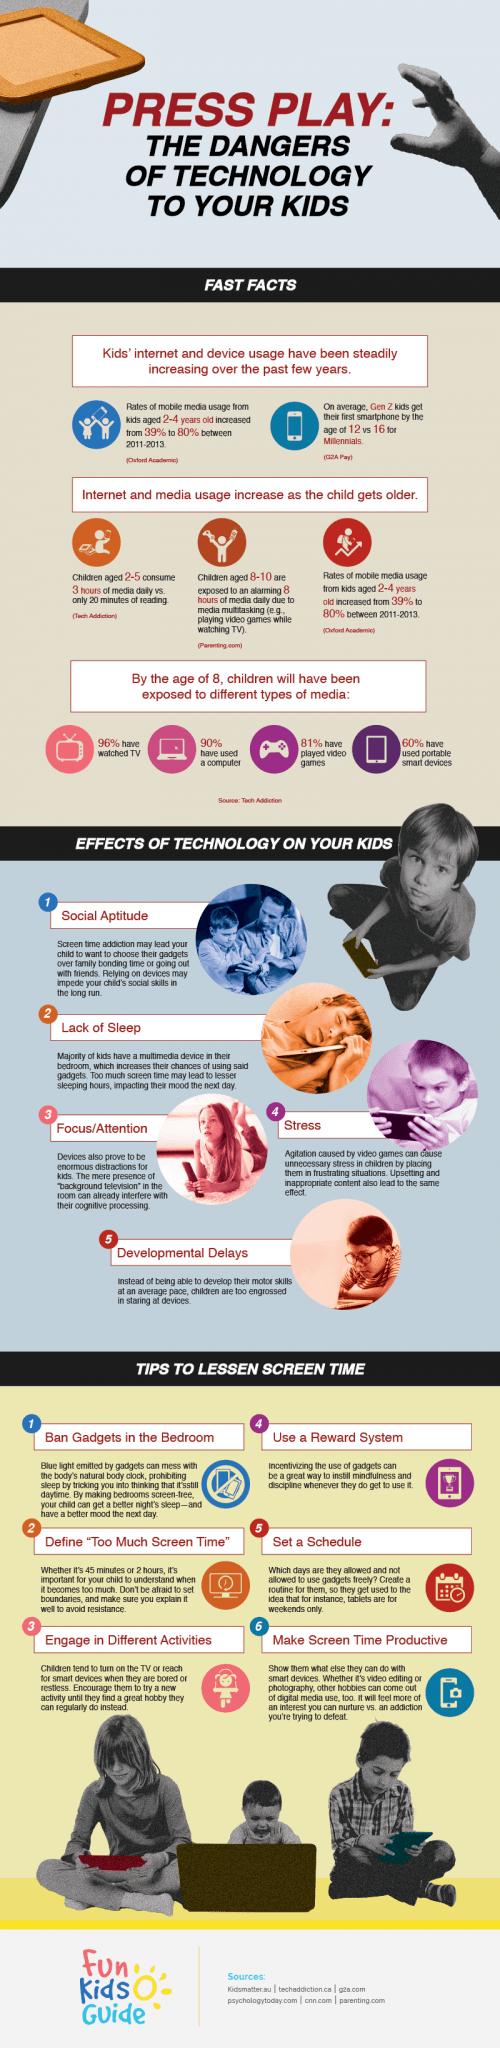 Press Play: Attitude And Behavior Of Kids Toward Technology